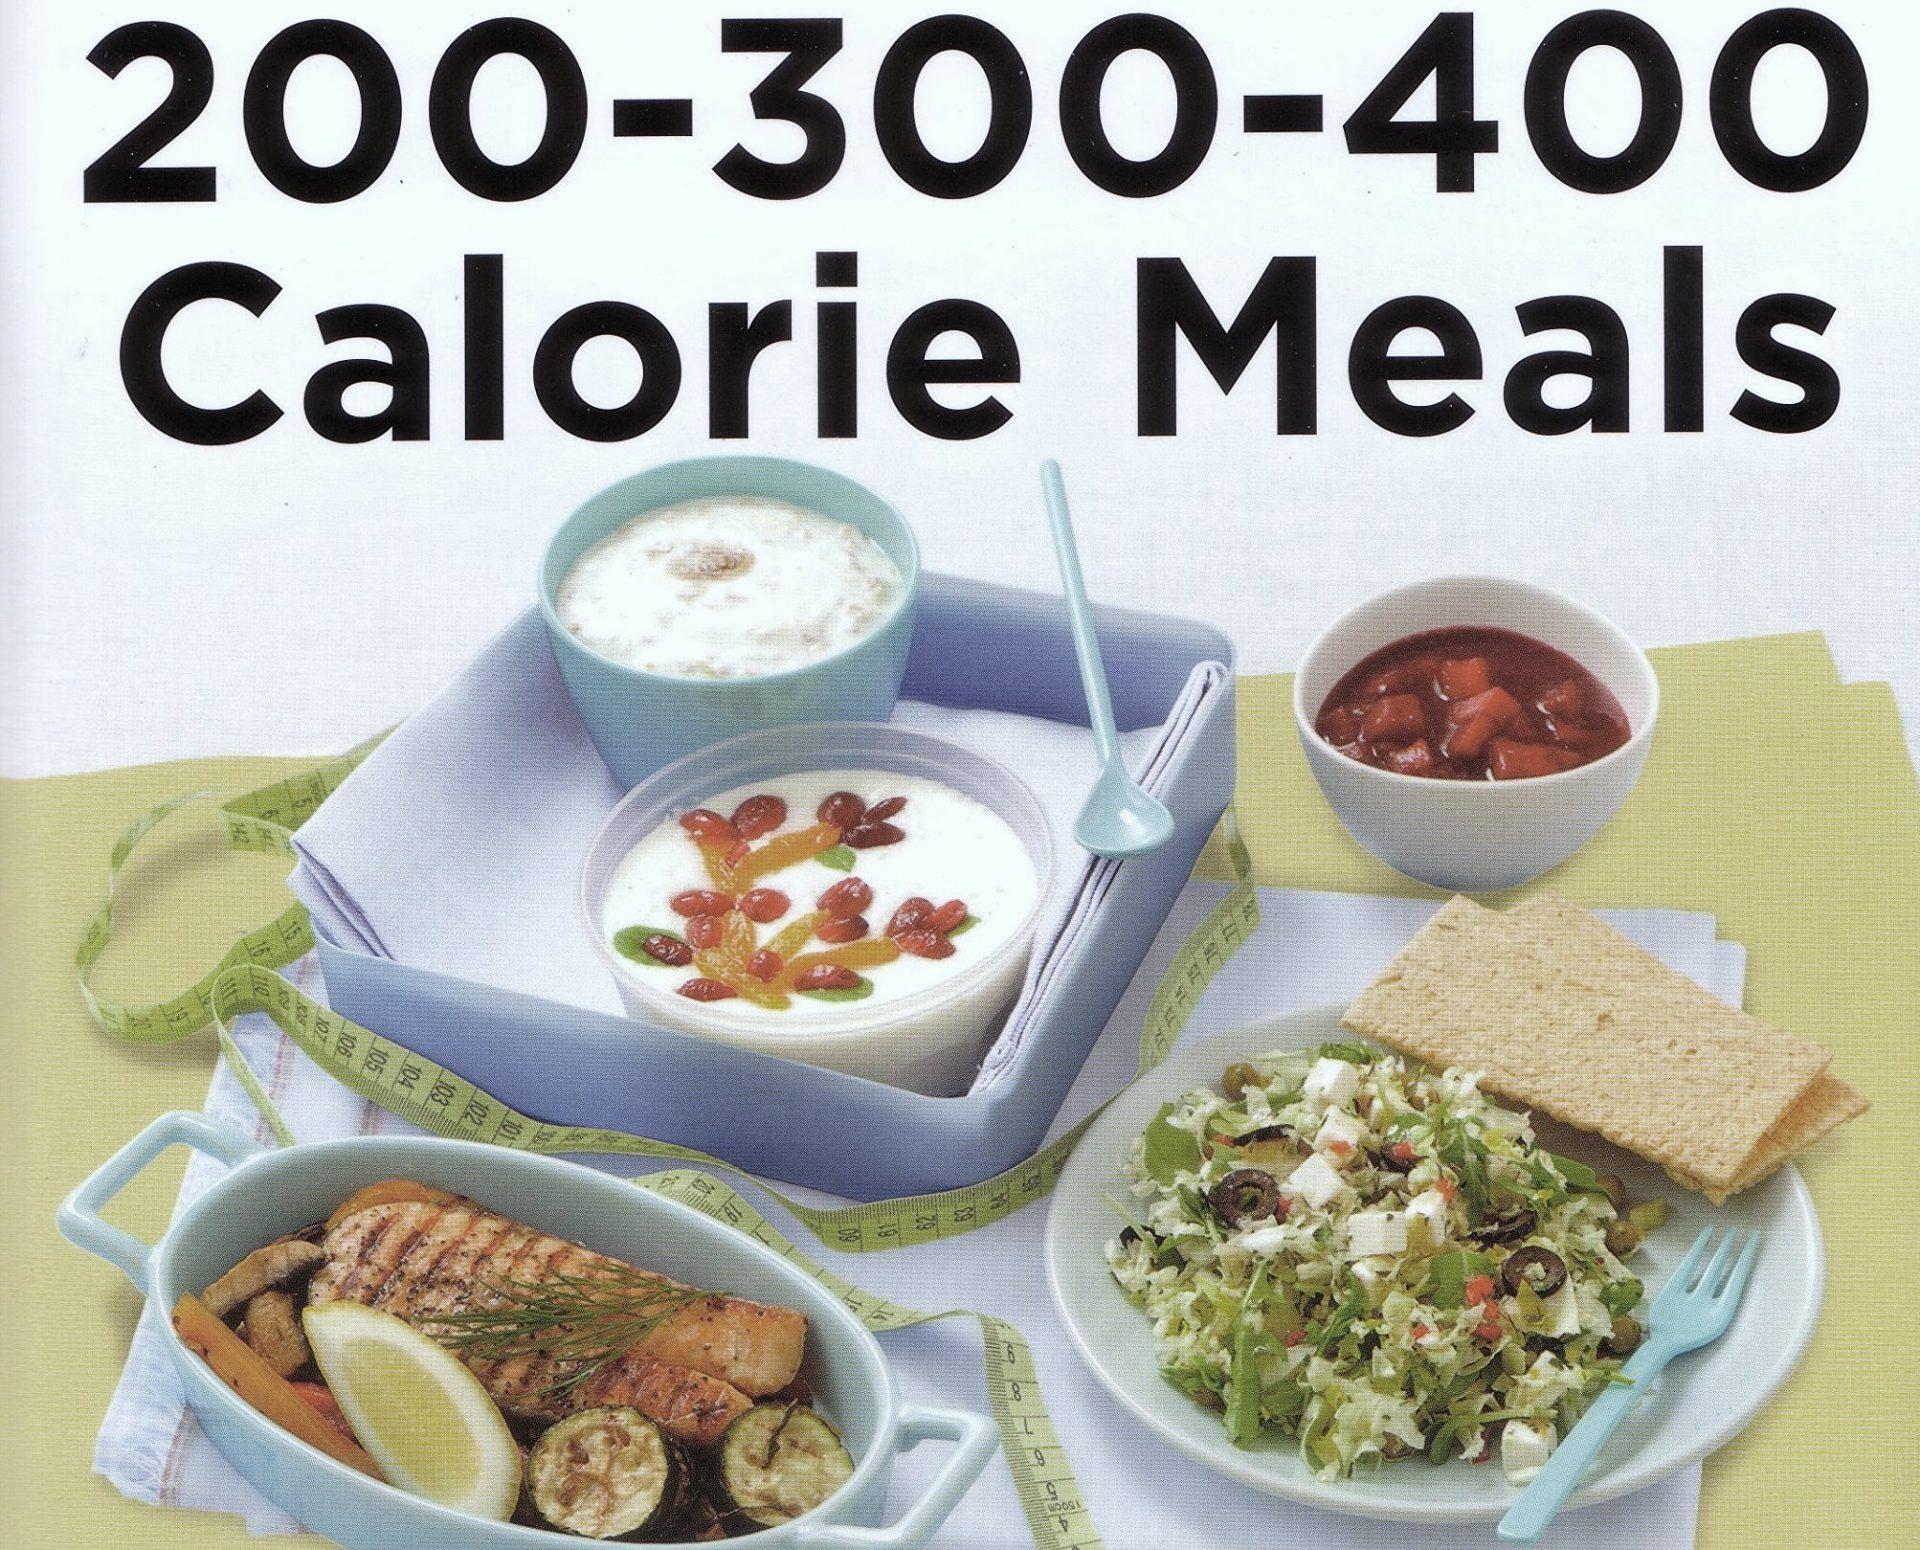 200 calorie meals reviews for women fitness program